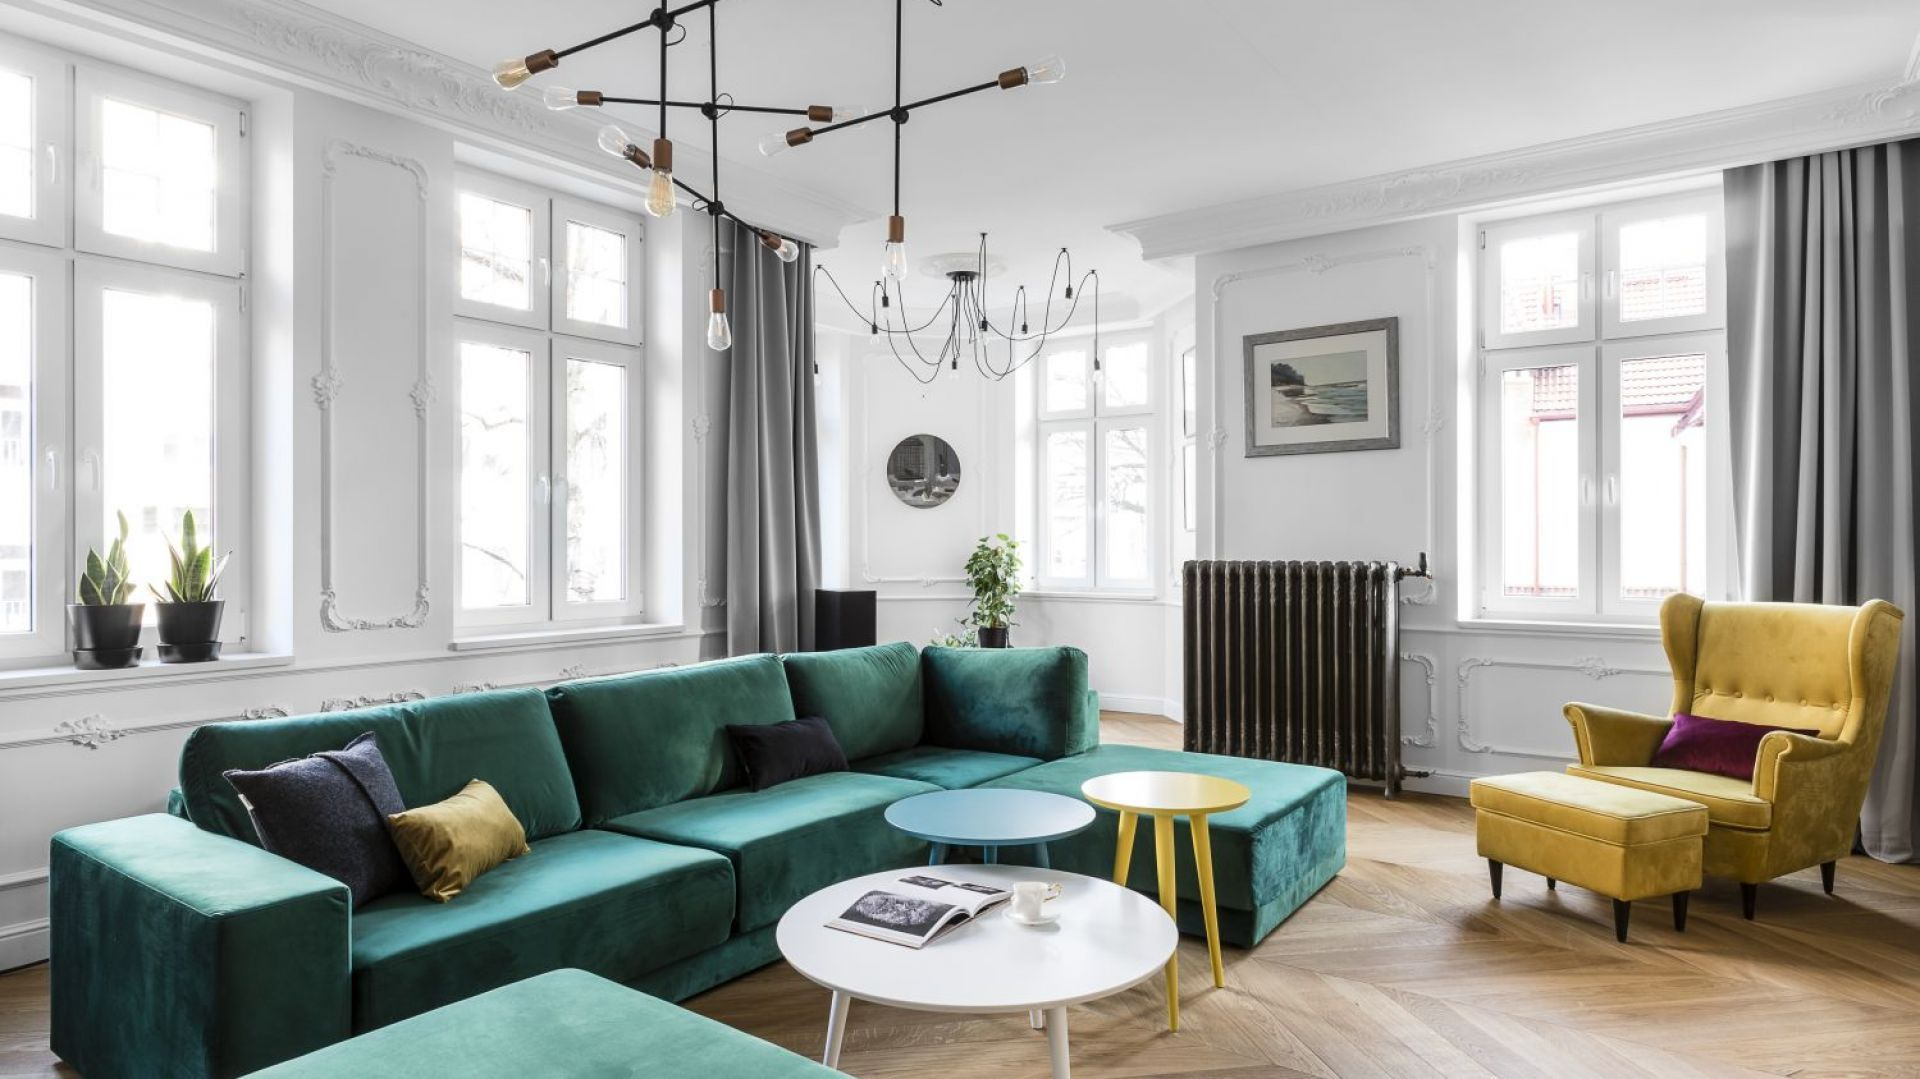 Zielona kanapa w salonie. Projekt: Anna Maria Sokołowska. Fot. Fotomohito